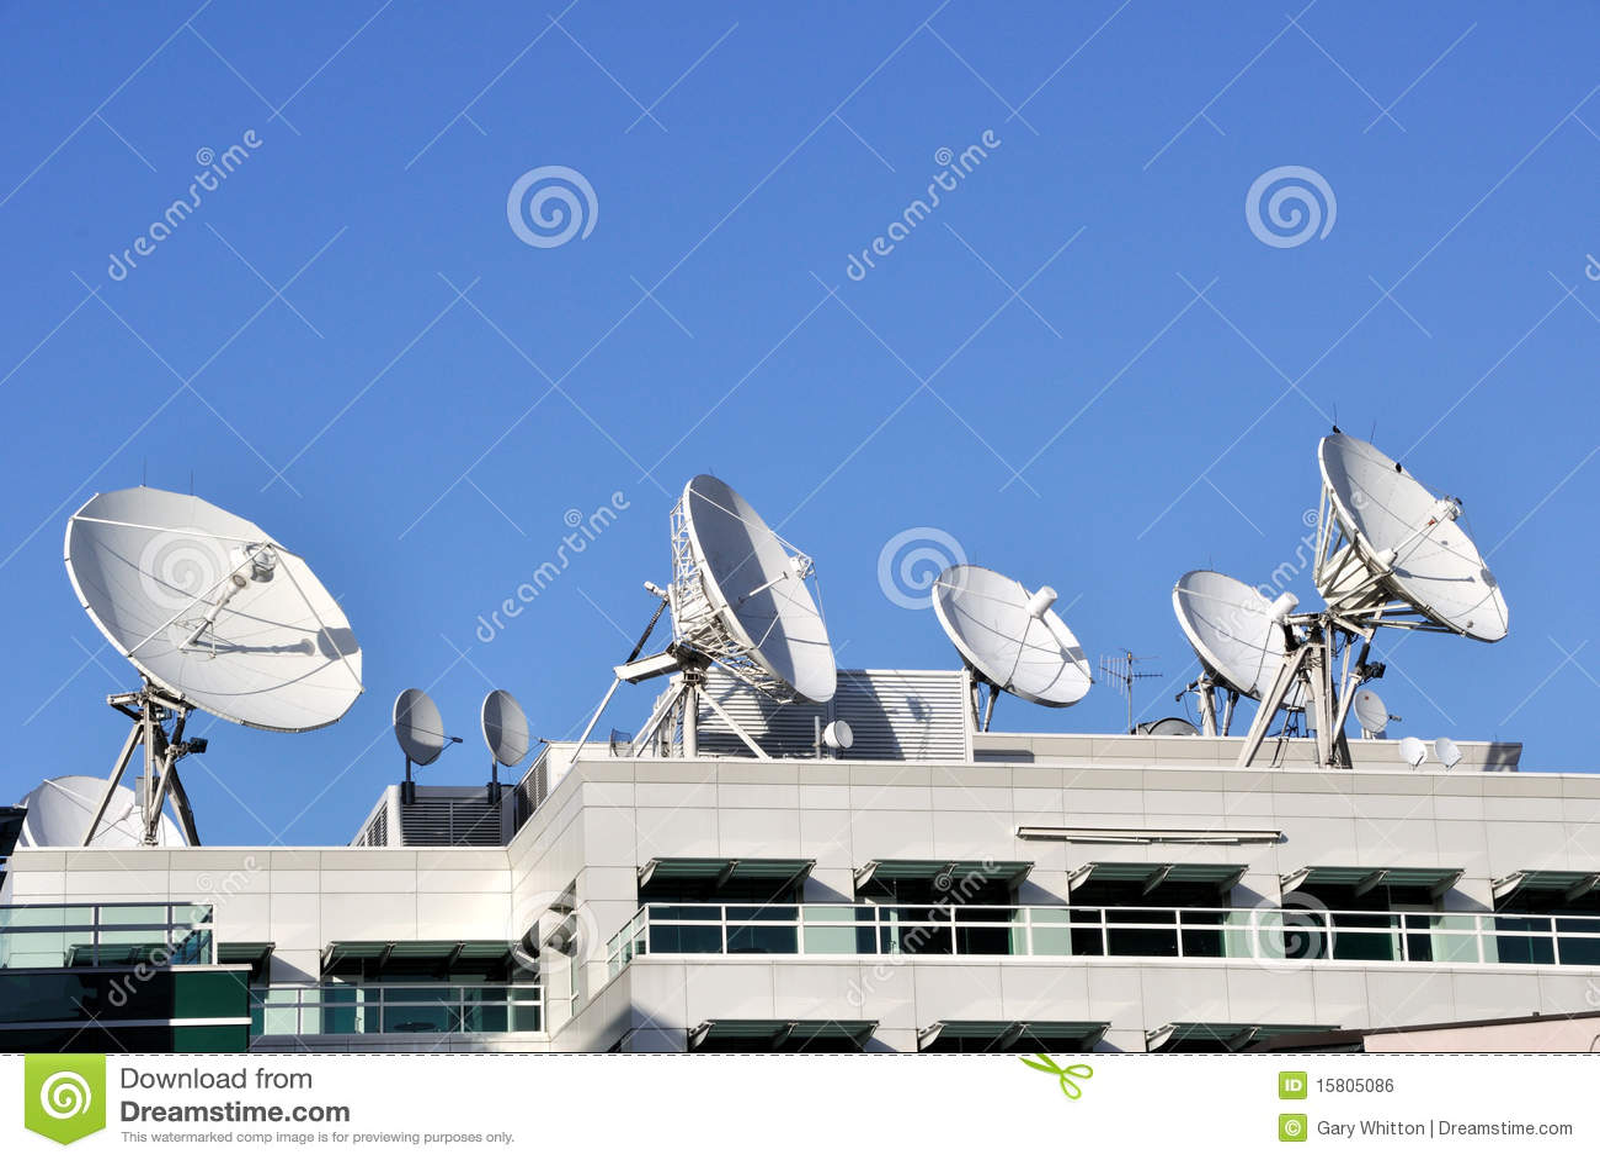 Kommunikationsdisksatellit